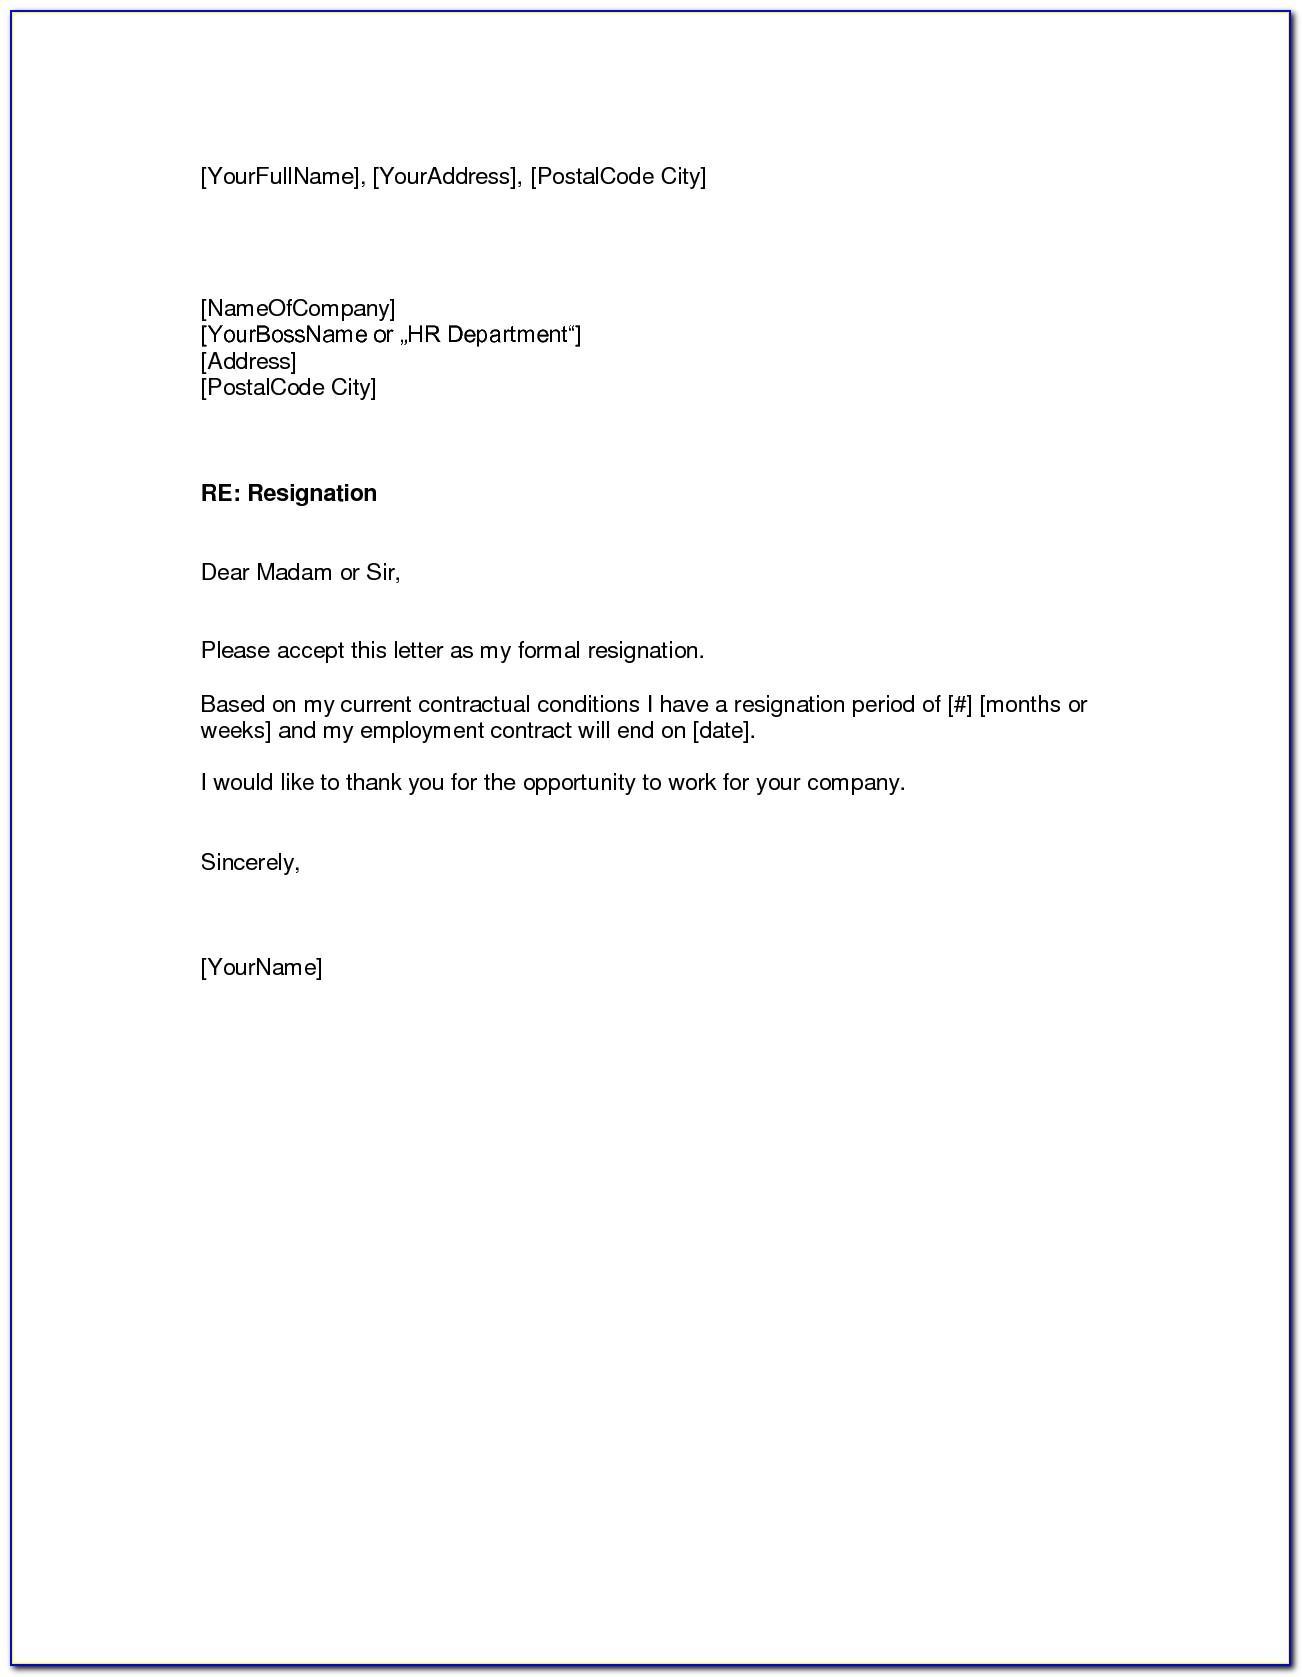 Template Resignation Letter Constructive Dismissal